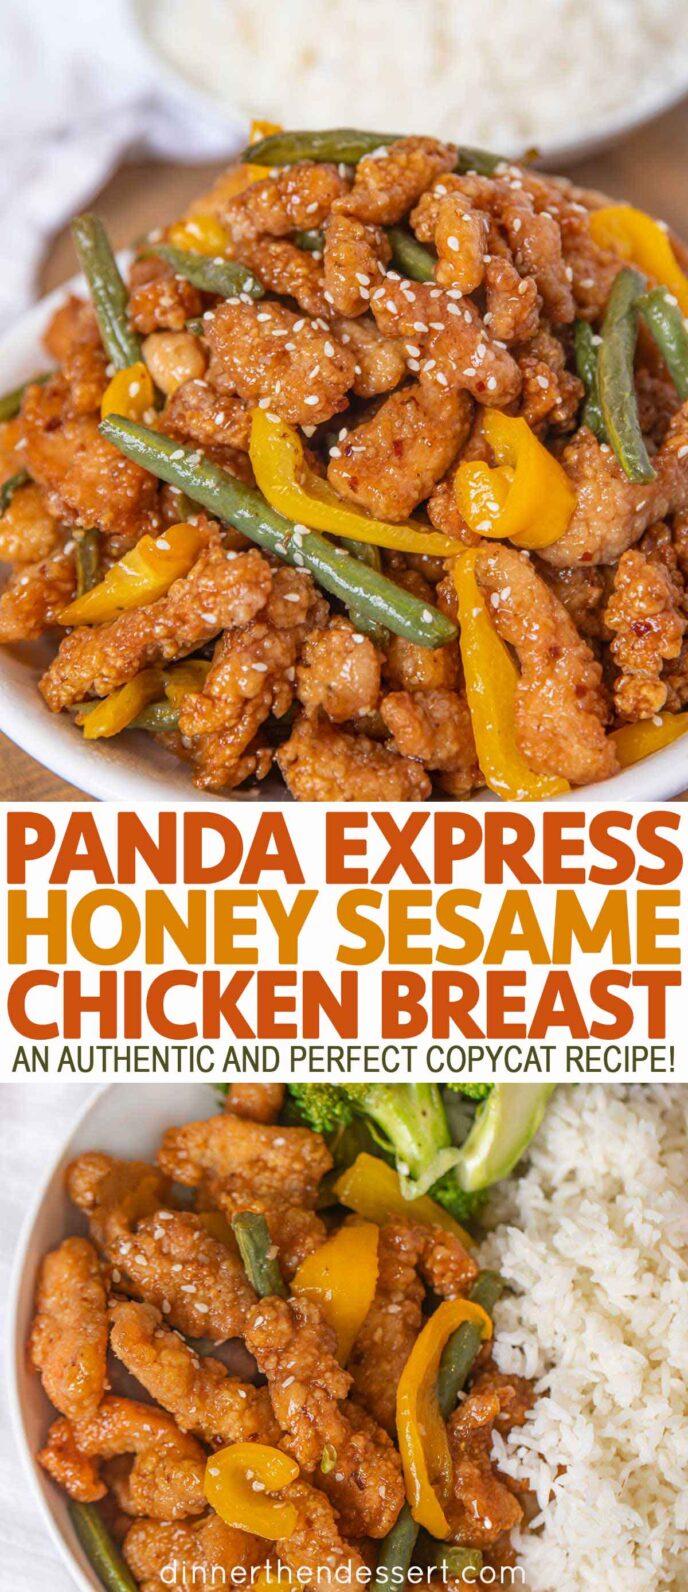 Honey Sesame Chicken Breast